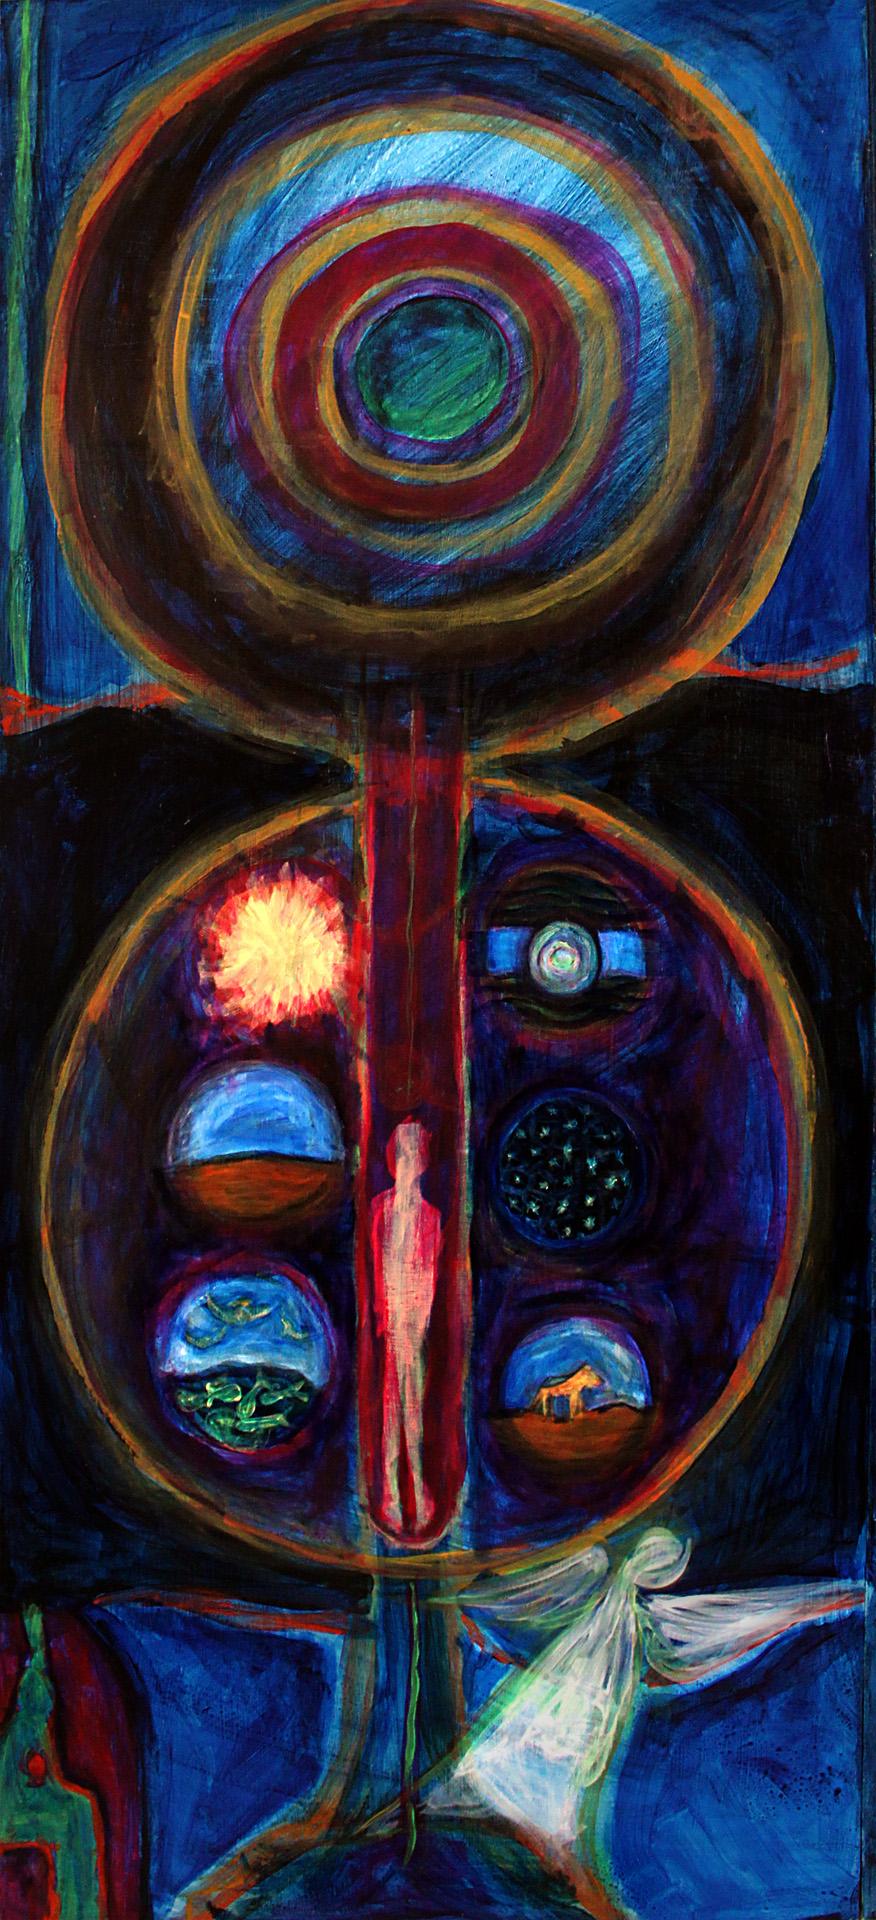 hildegard_of_bingen_painting_panel4_by_Sybil_Archibald.jpg